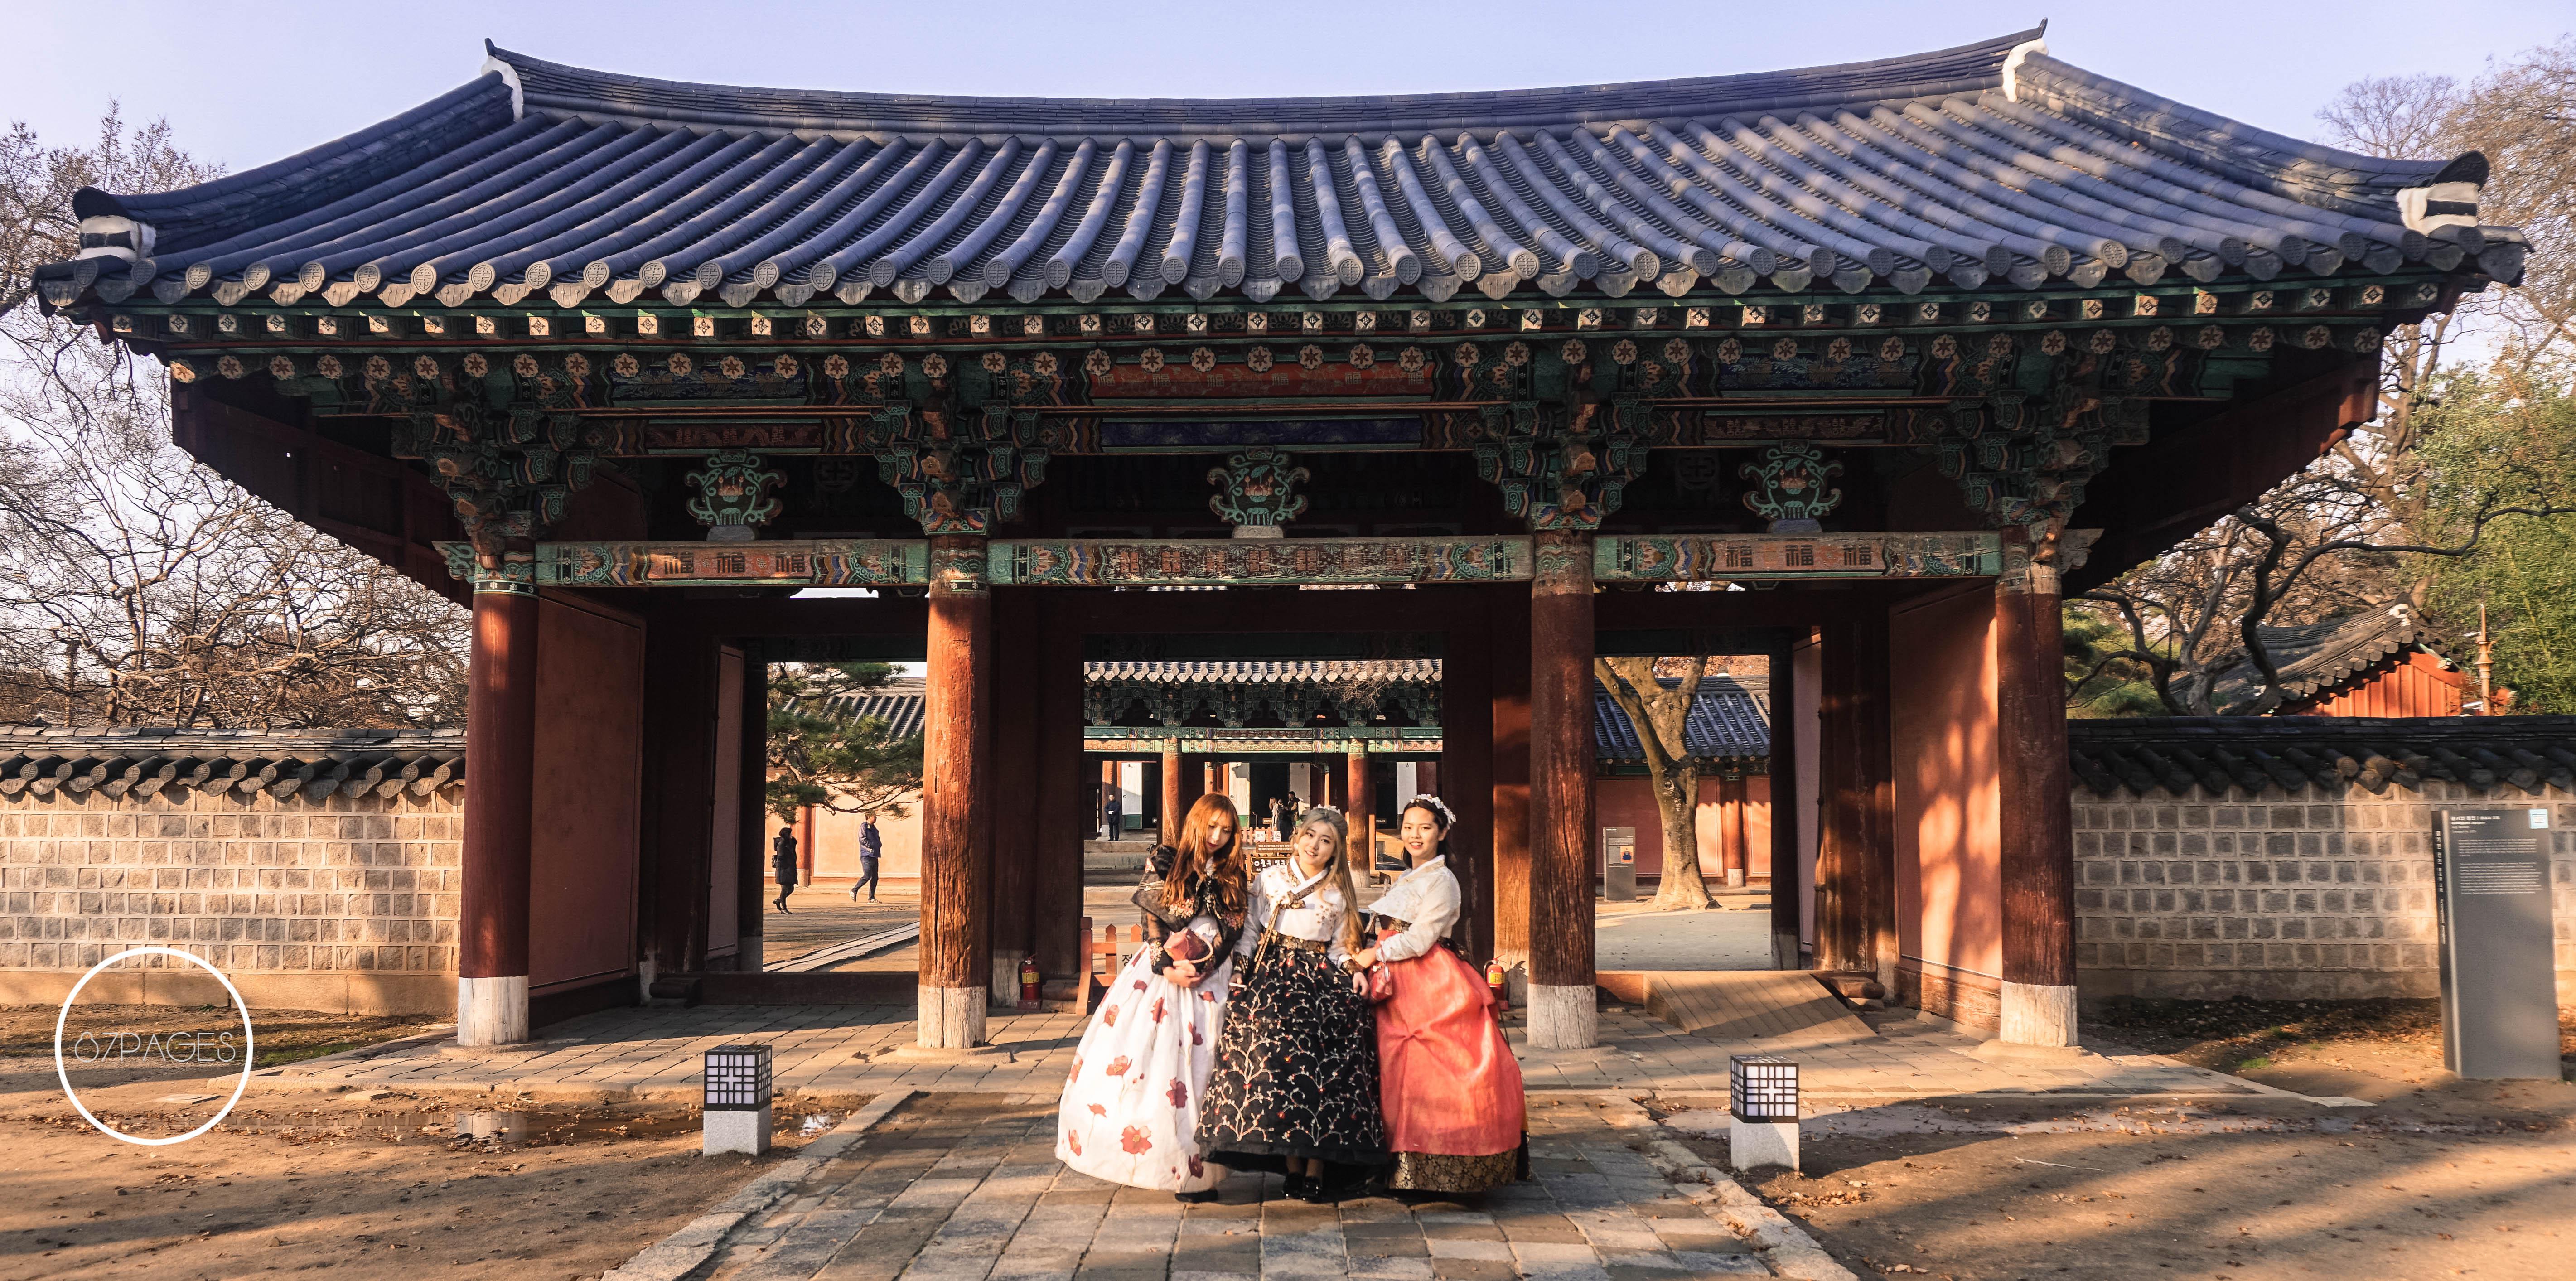 3 Day Guide For Exploring Jeollabuk-do Province